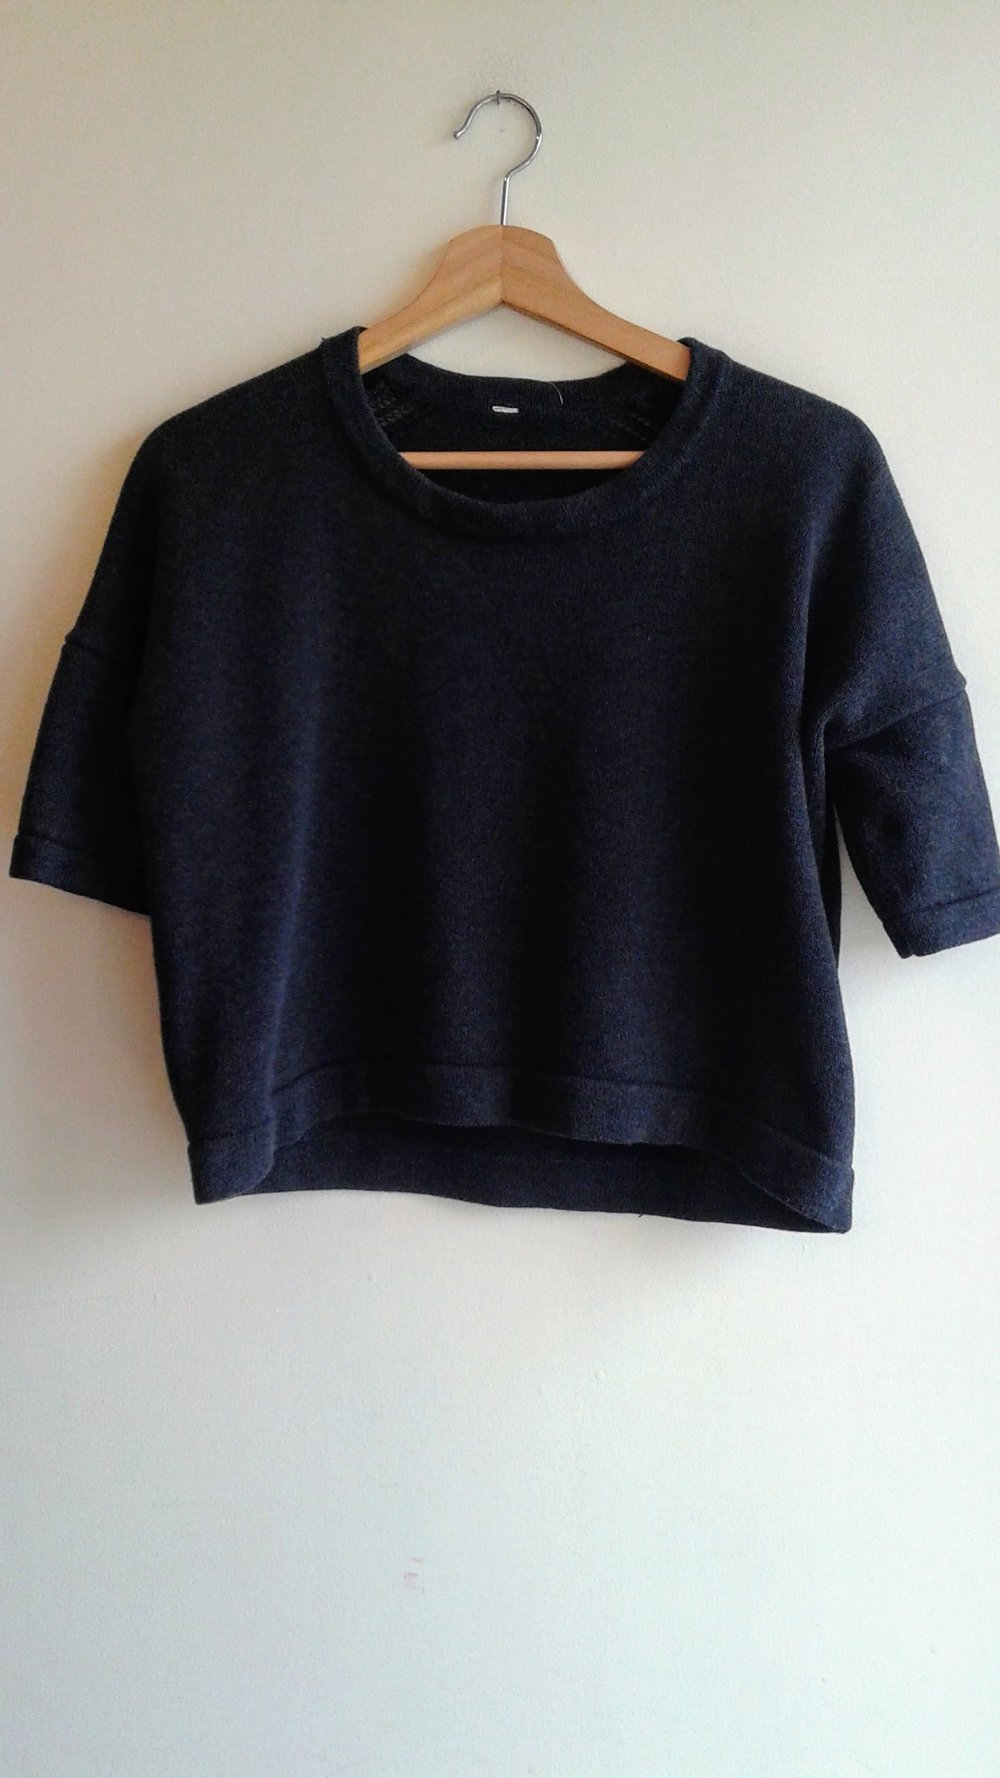 Lululemon top; Size M, $20